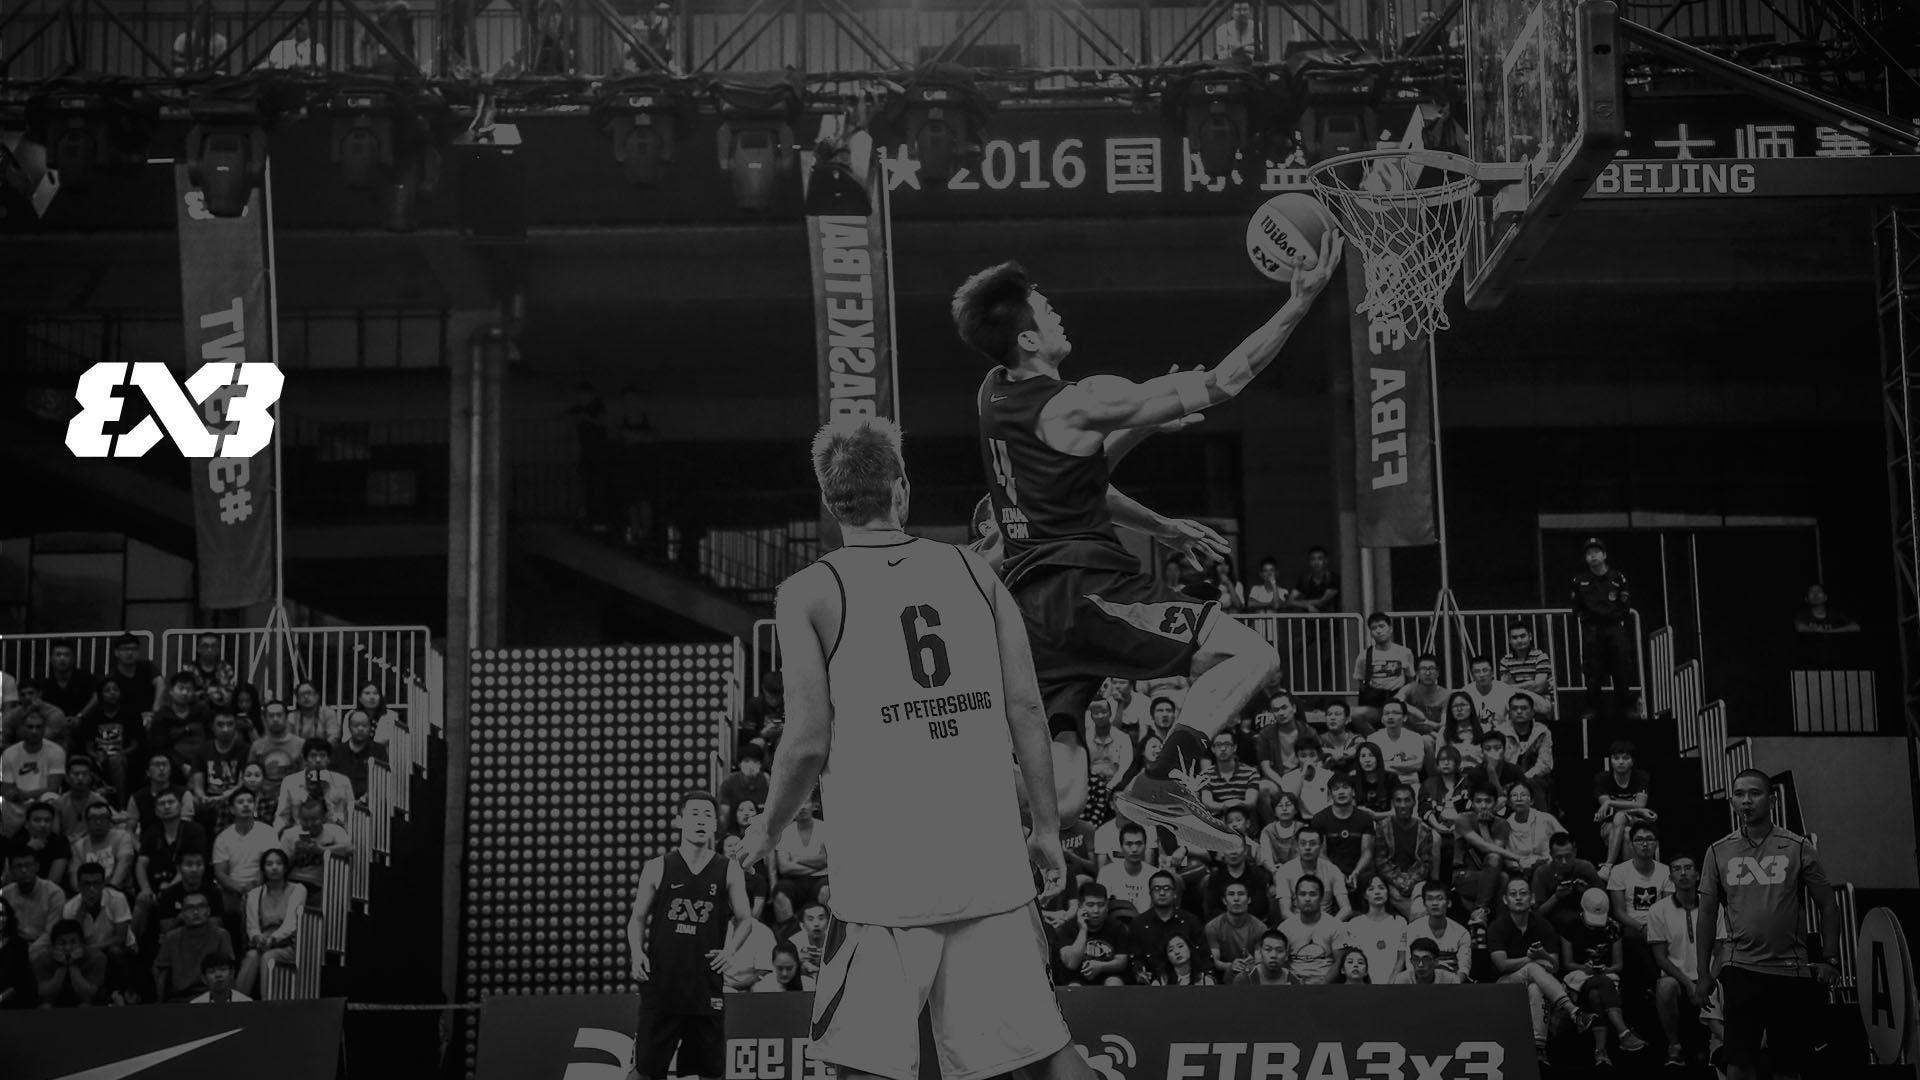 FIBA 3x3 player making a lay-up